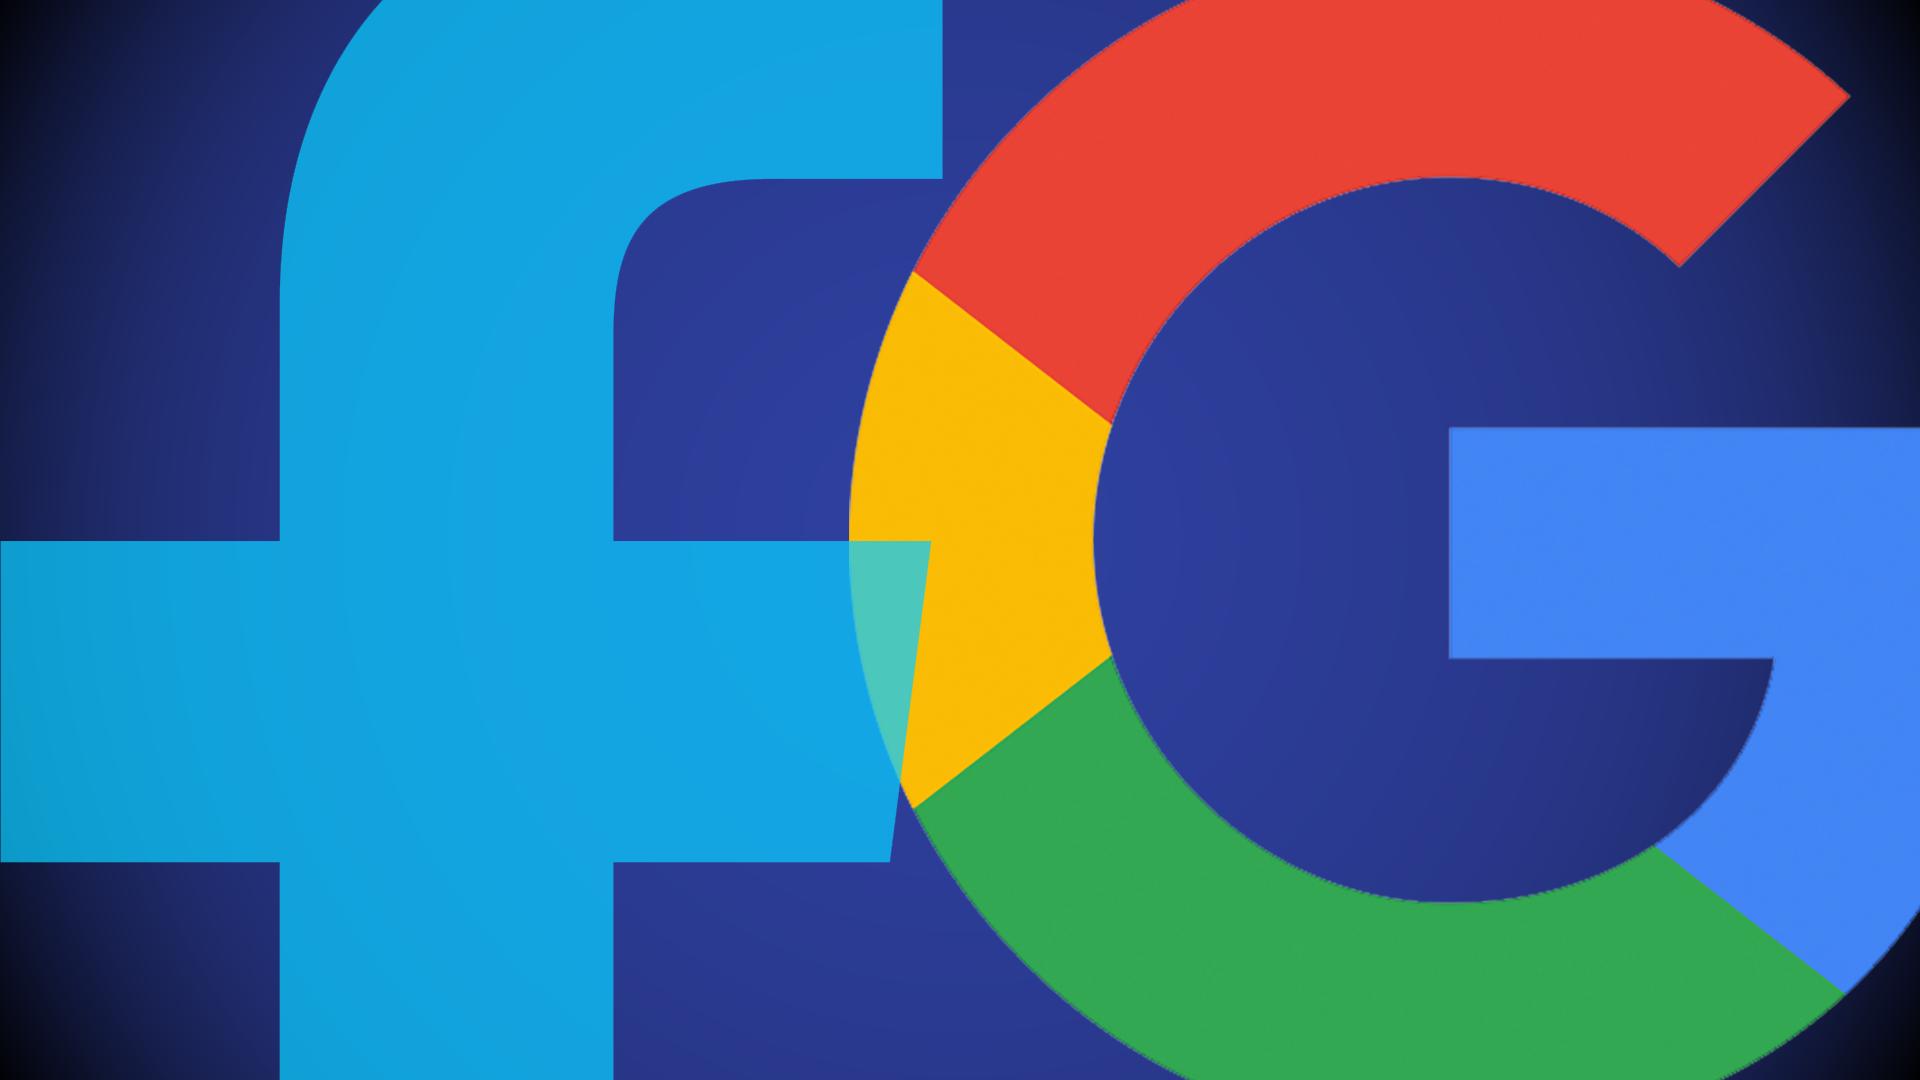 google-facebook-new1-1920